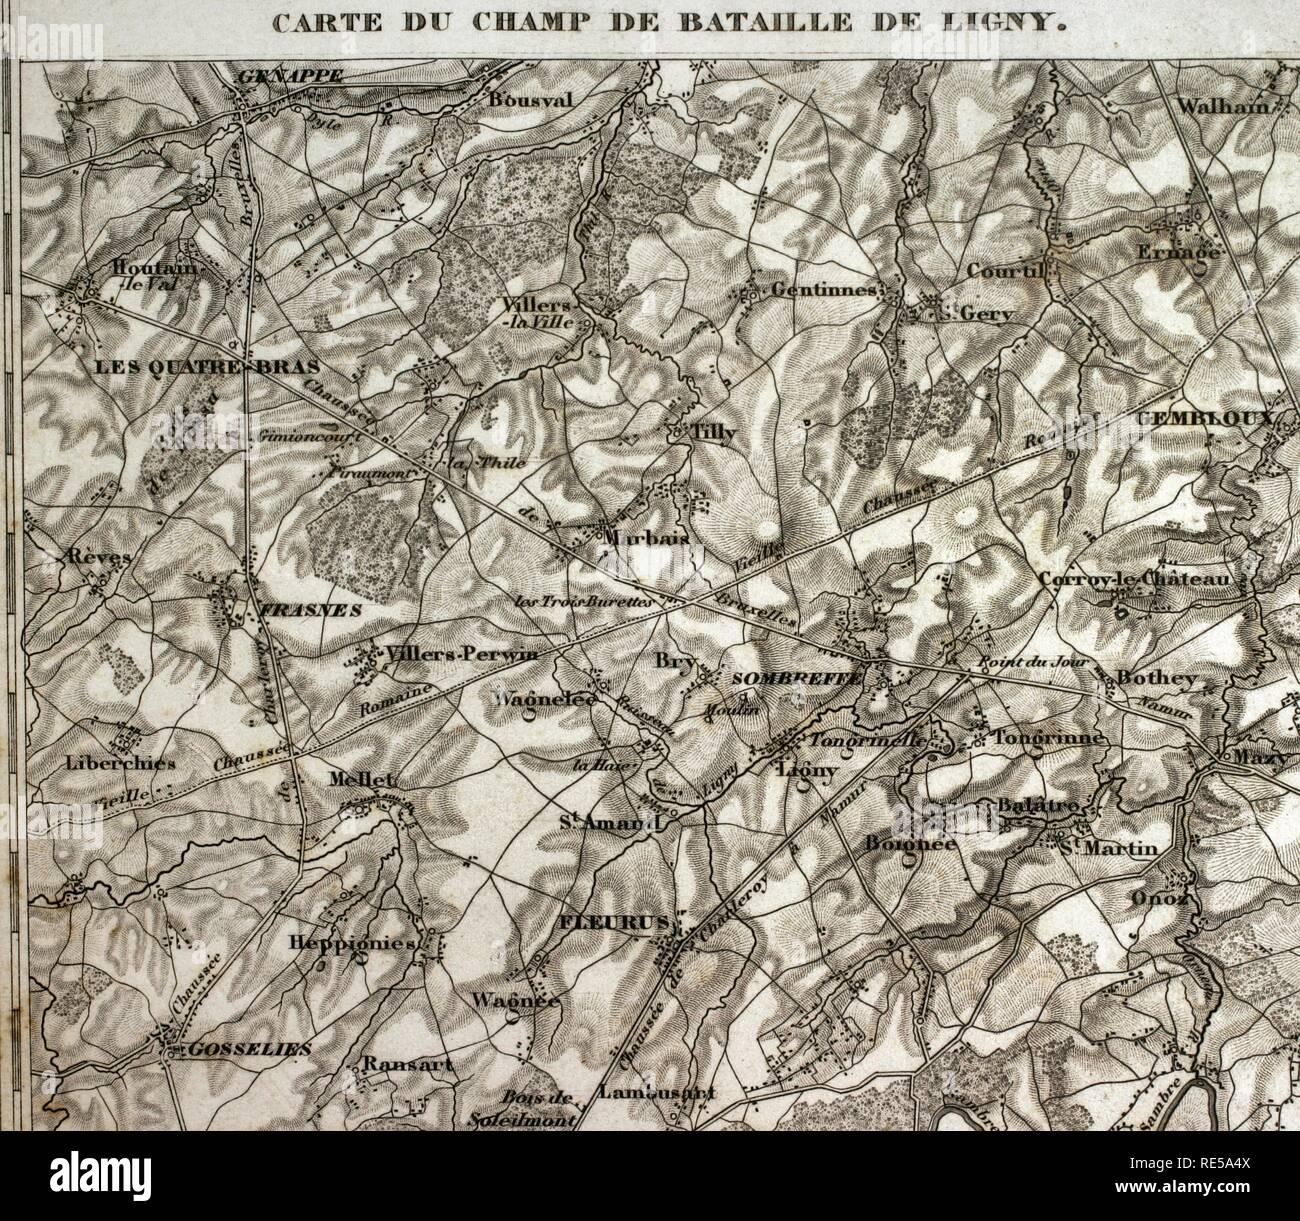 BATTLE OF LIGNY Belgium Napoleonic Wars 1848 old antique map 16th June 1815